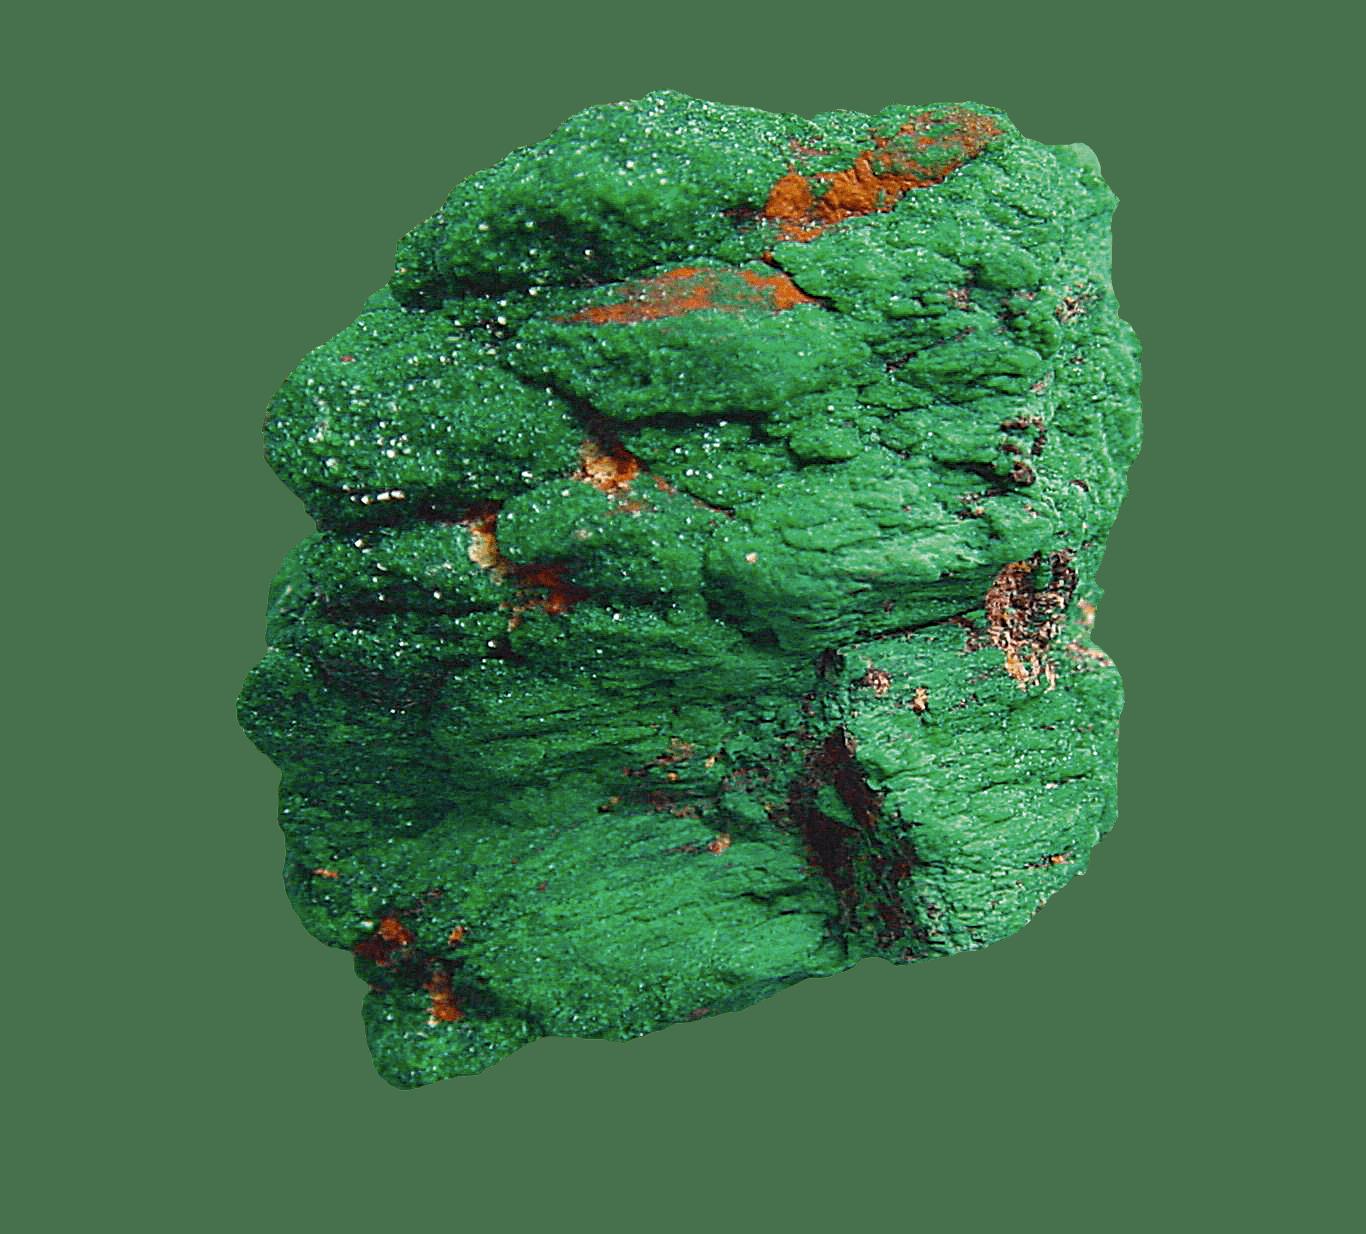 Antlérite